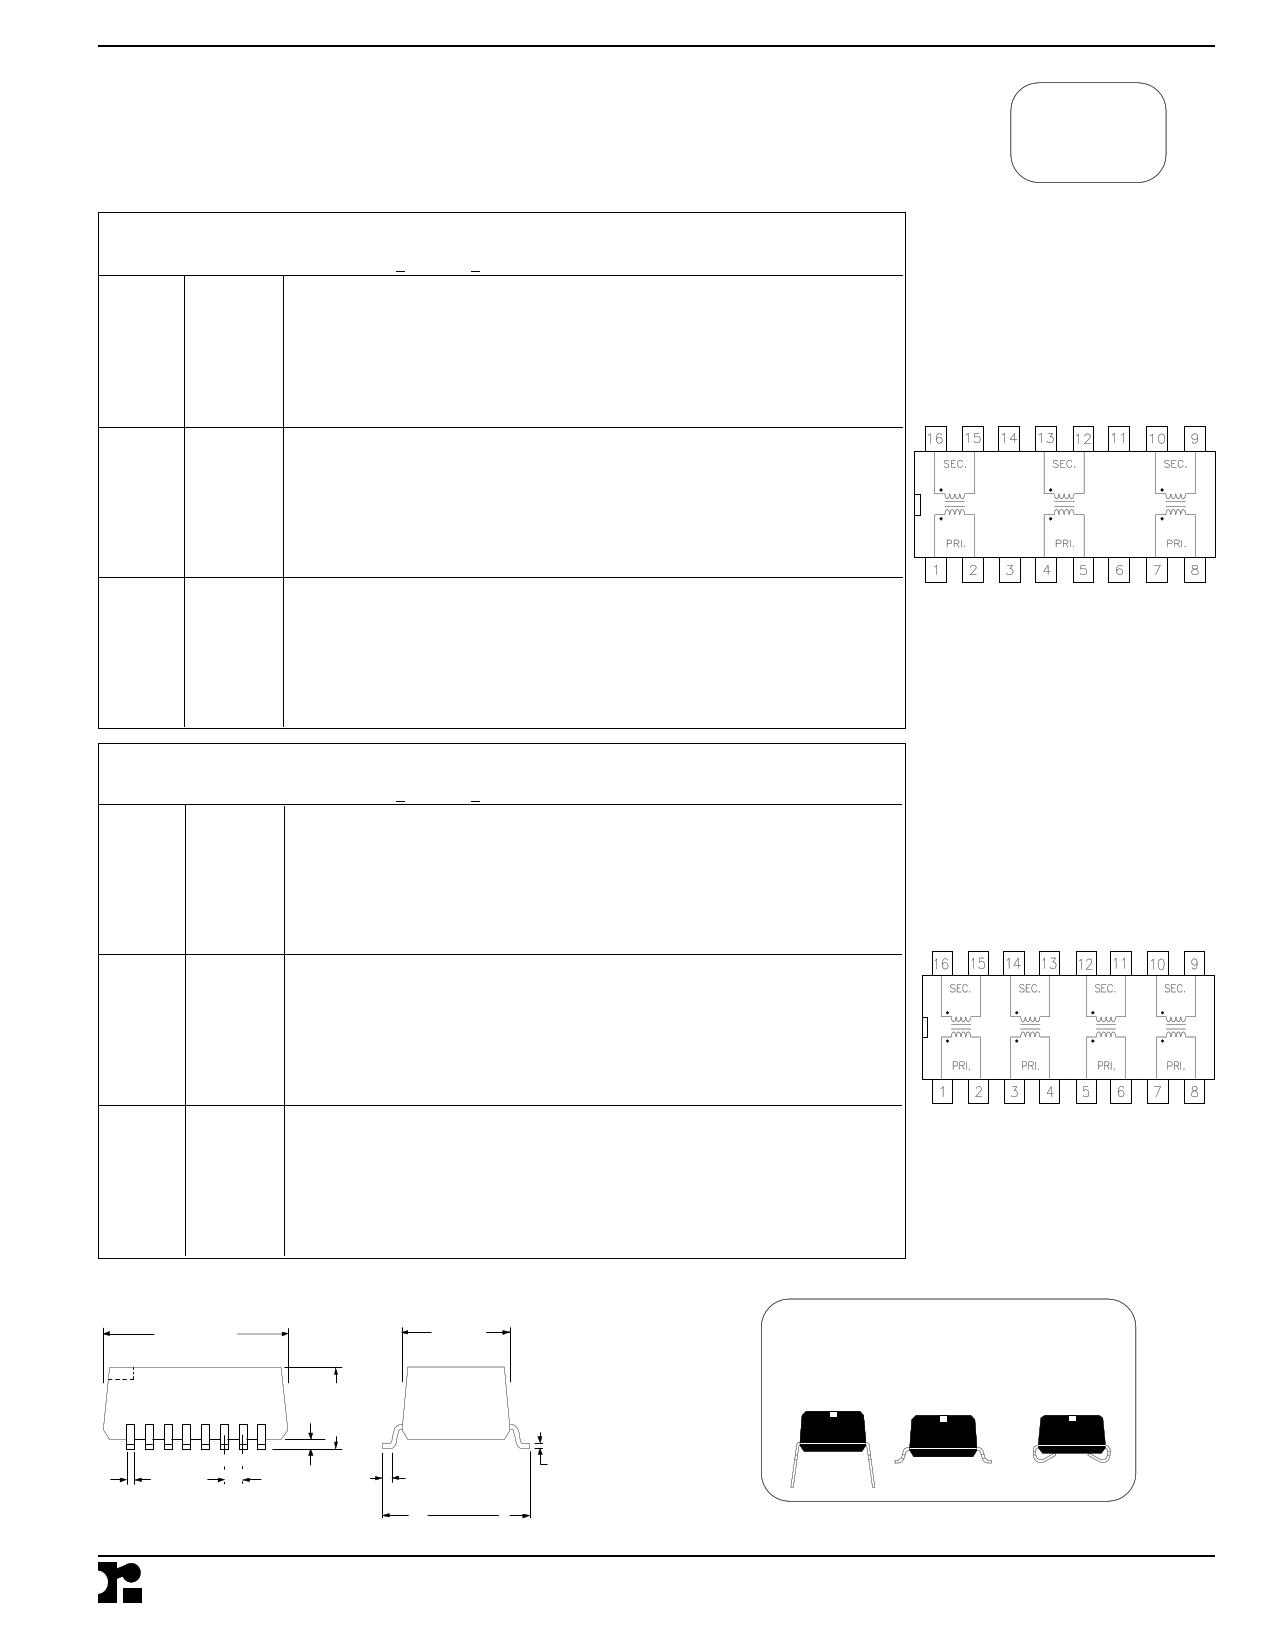 T-1400x datasheet